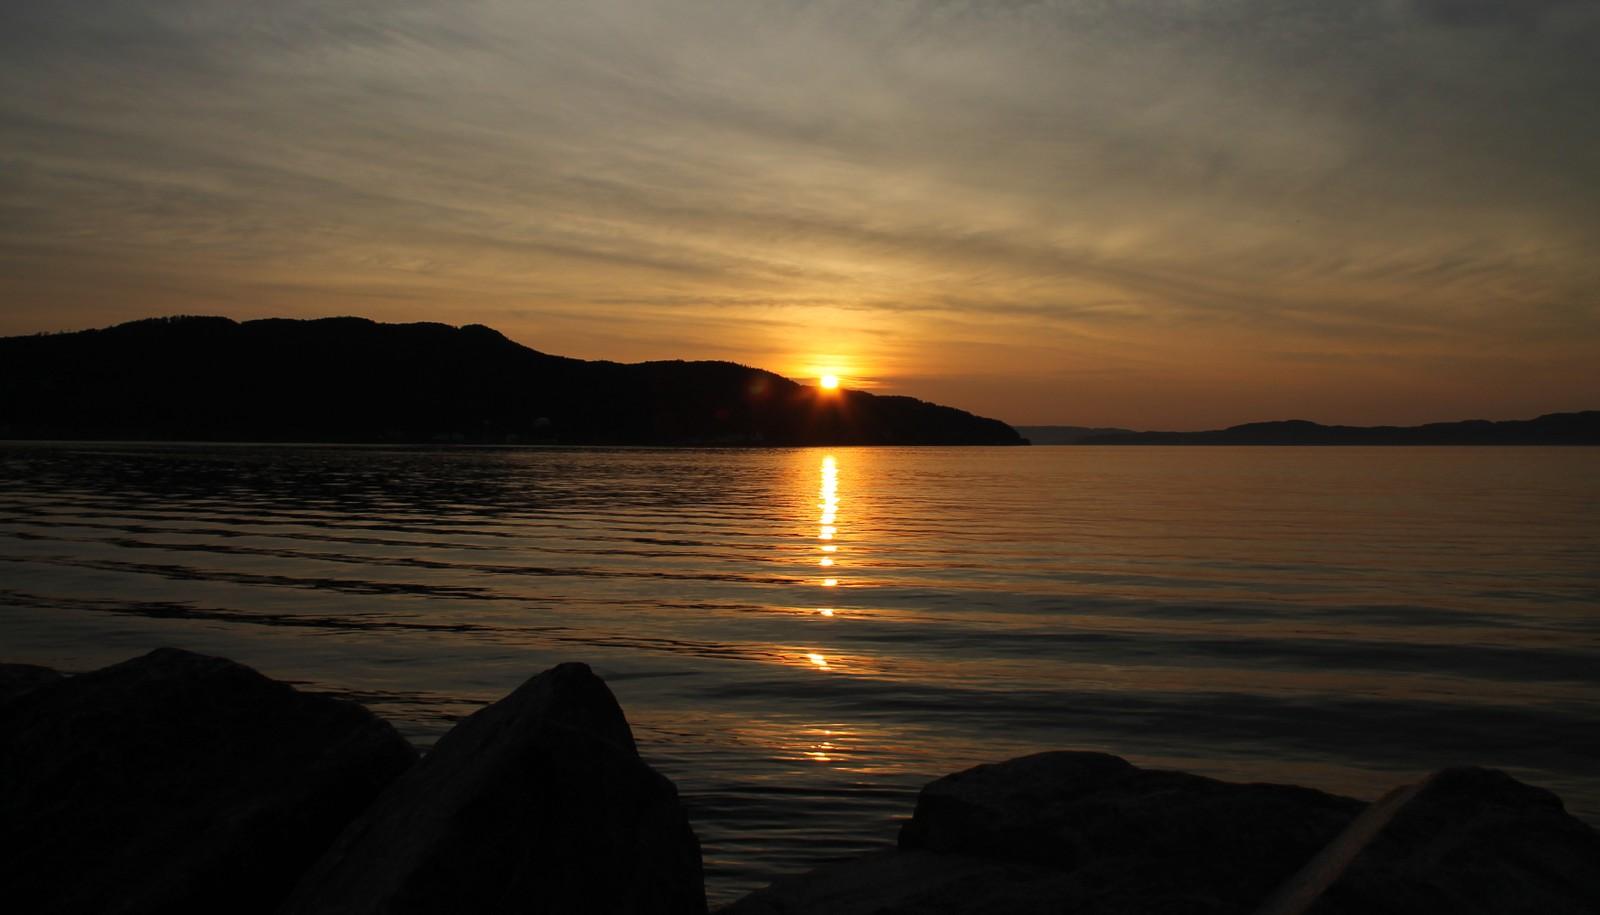 Solnedgang ved Trondheimsfjorden